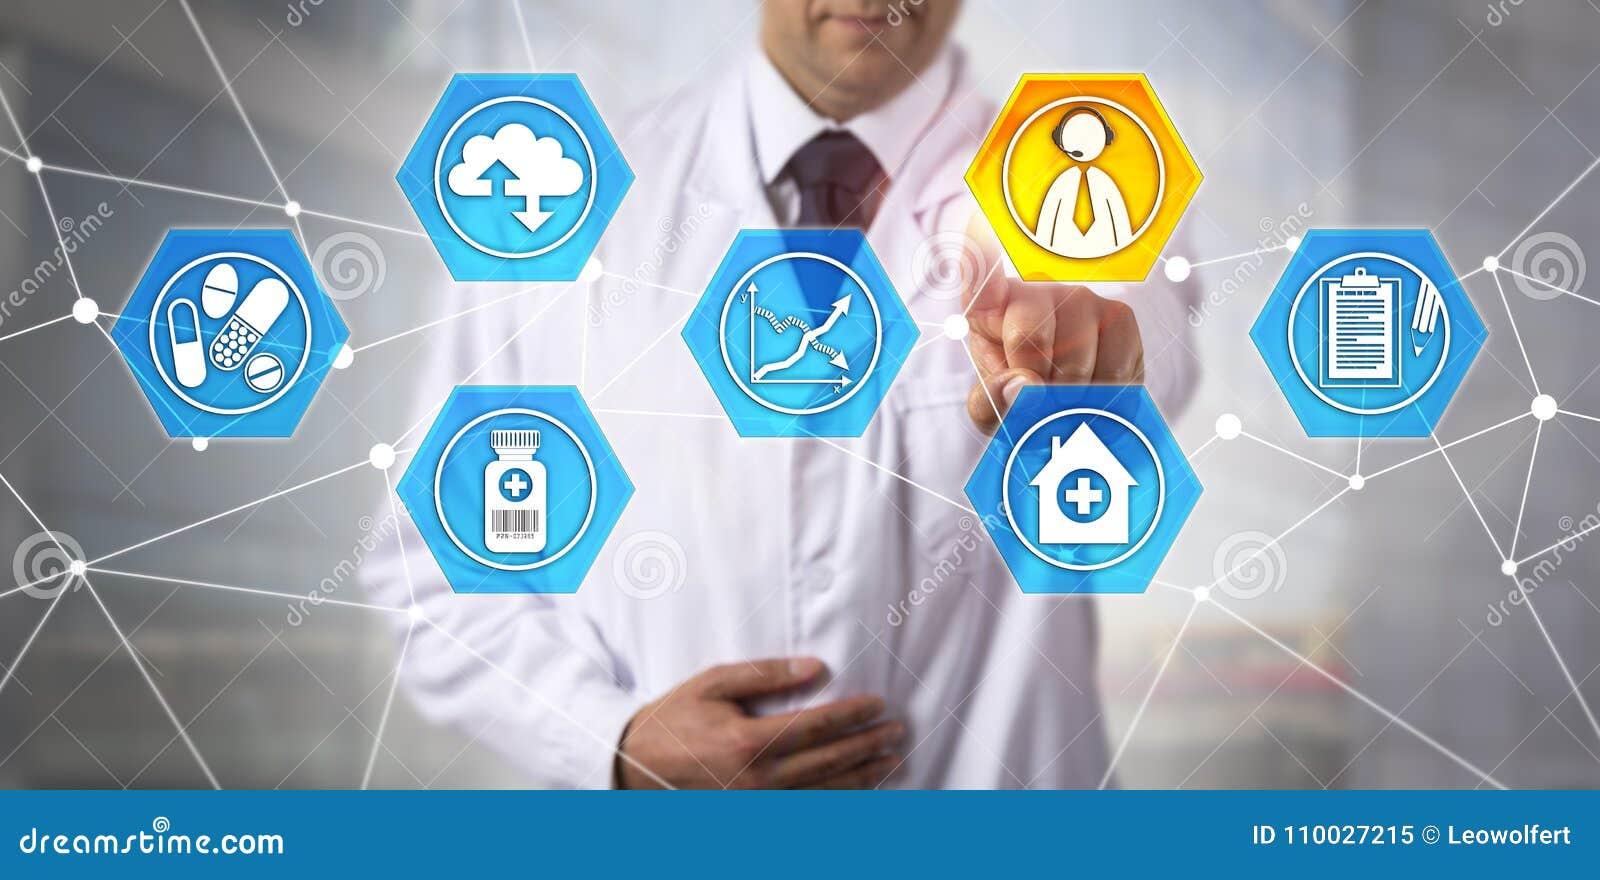 Biomedische Ingenieur Using Web-Based Response